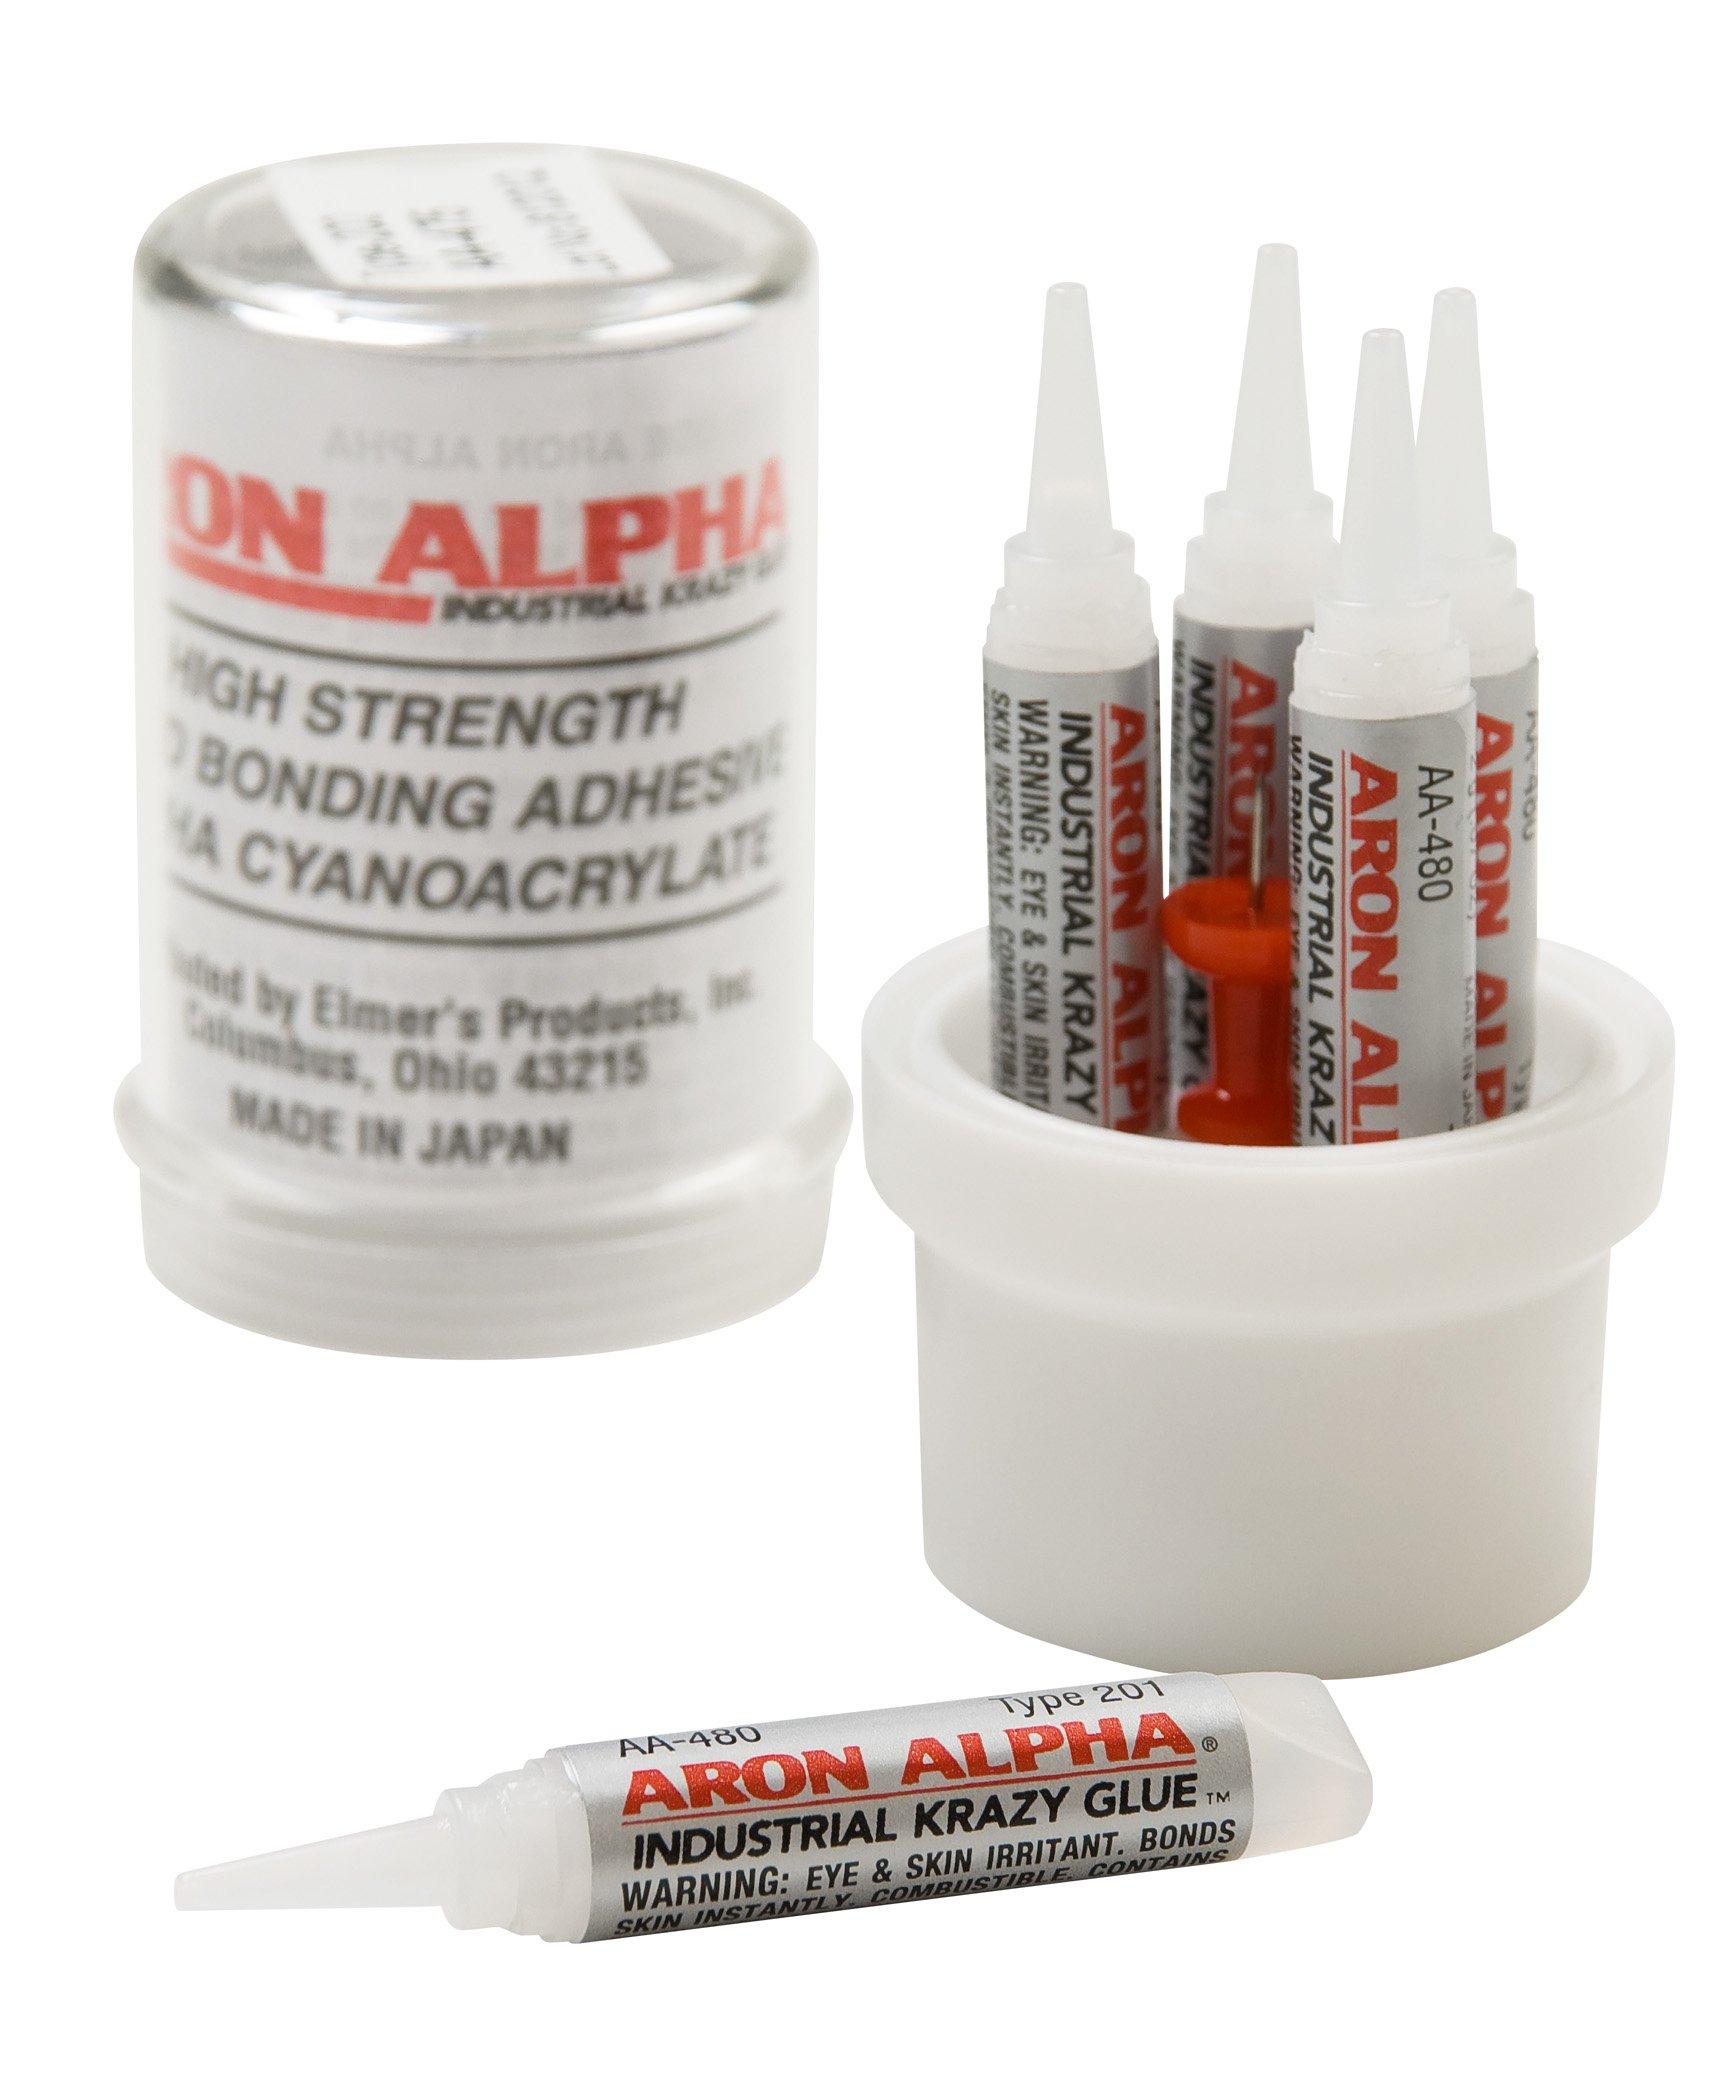 Aron Alpha Type 201 (2 cps viscosity) Regular Set Instant Adhesive, 10 g Capsule, 5 Tubes x 2 g (0.07 oz)